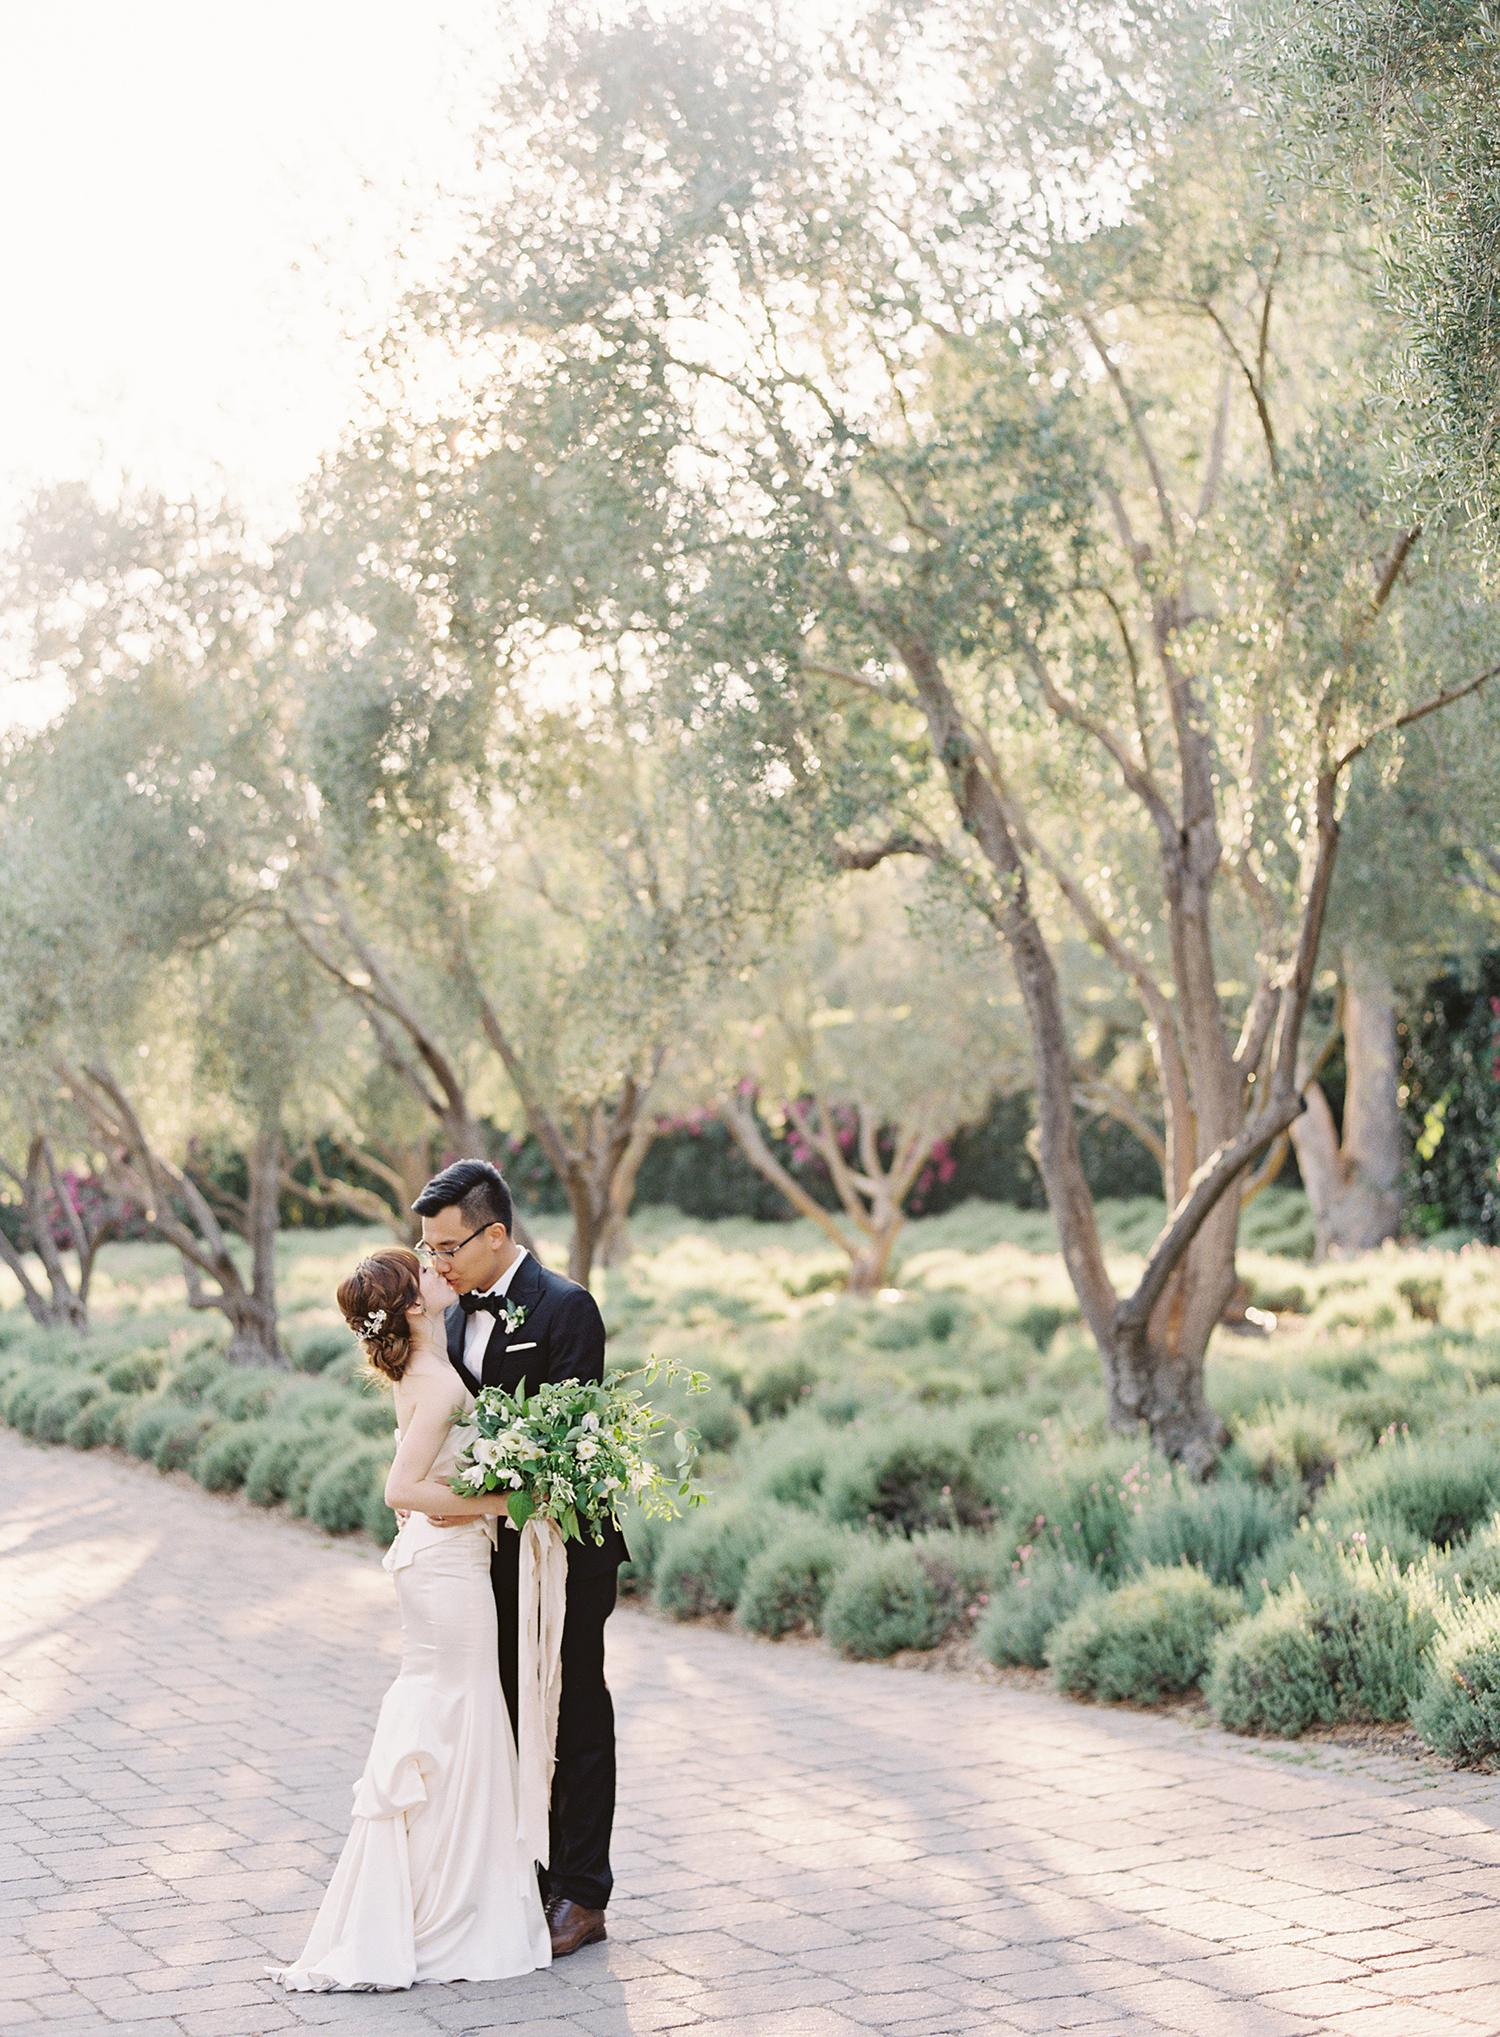 Mandy & jason - Montecito